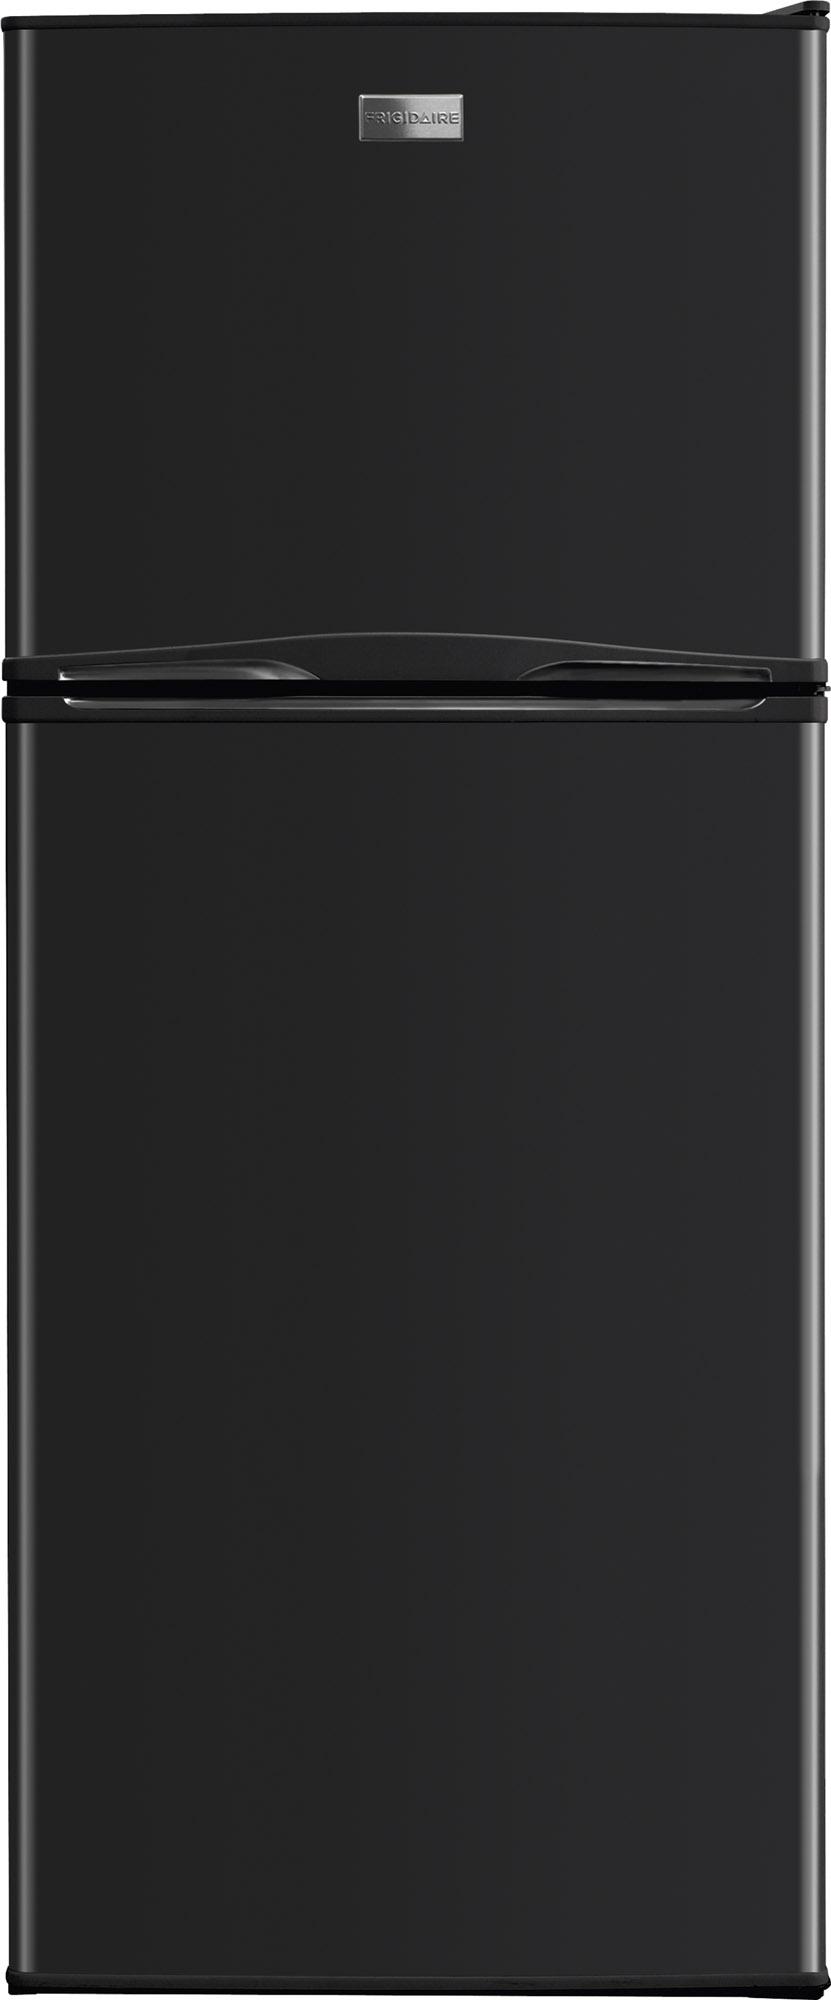 Frigidaire 12 Cu. Ft. Top Freezer Apartment Size Refrigerator-Black ...